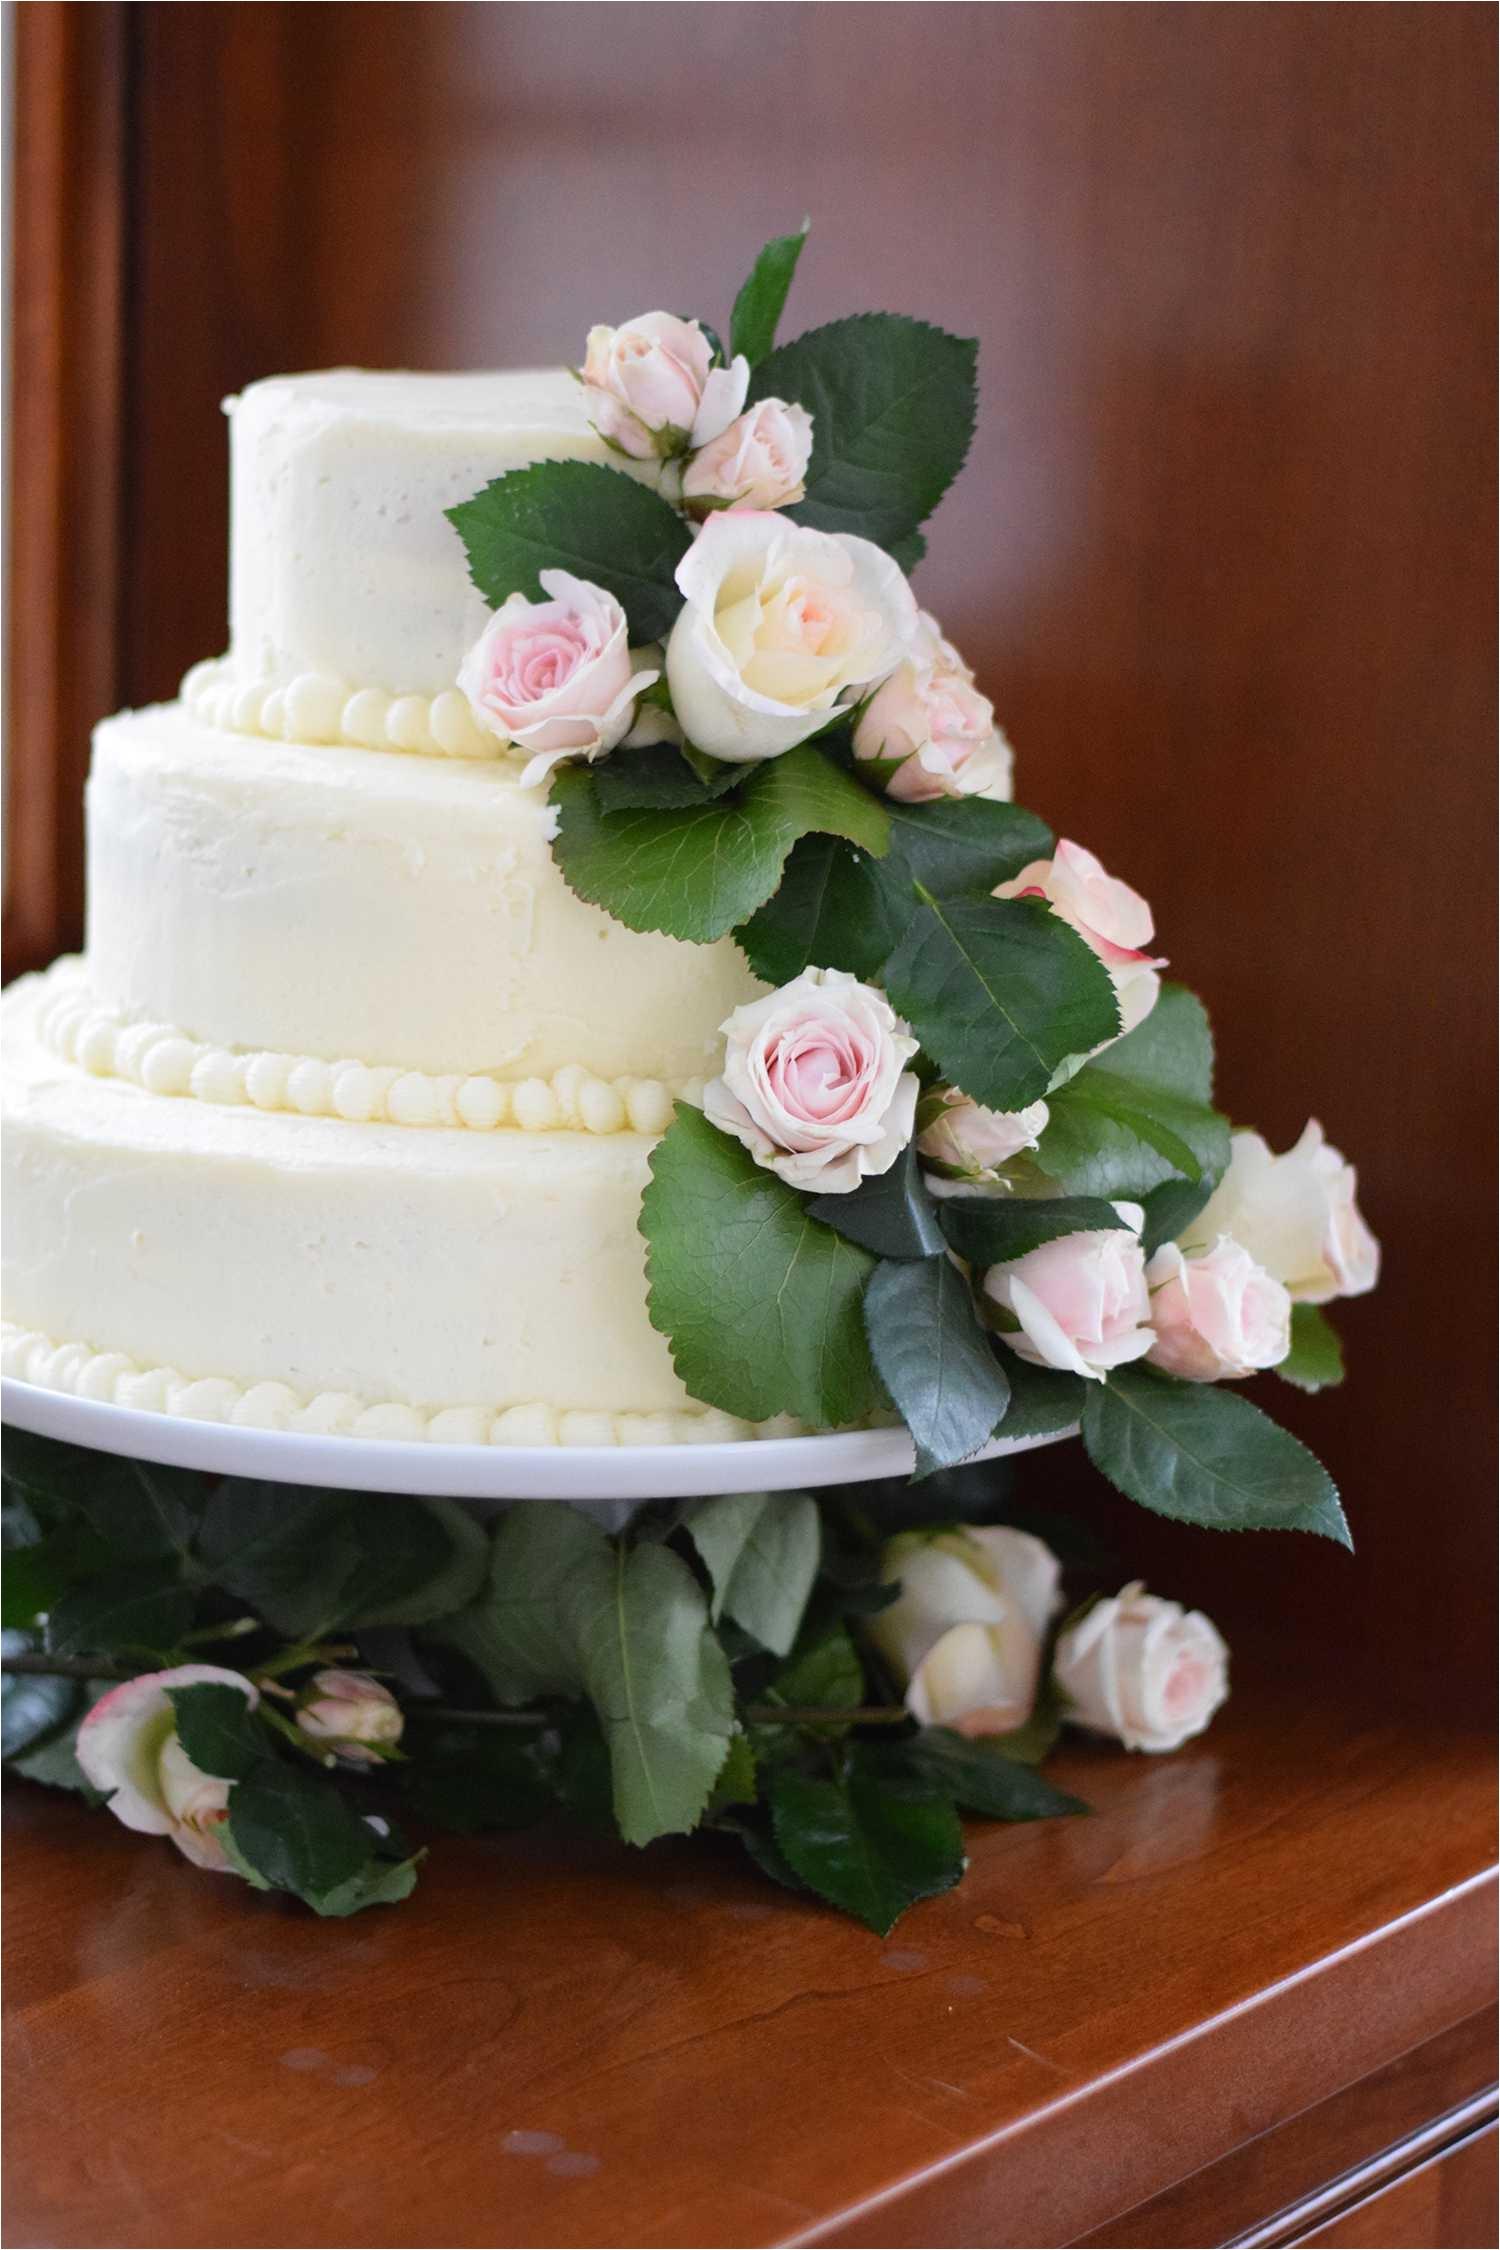 weddingcakefinal 5a7bc079d8fdd500379ea71c jpg